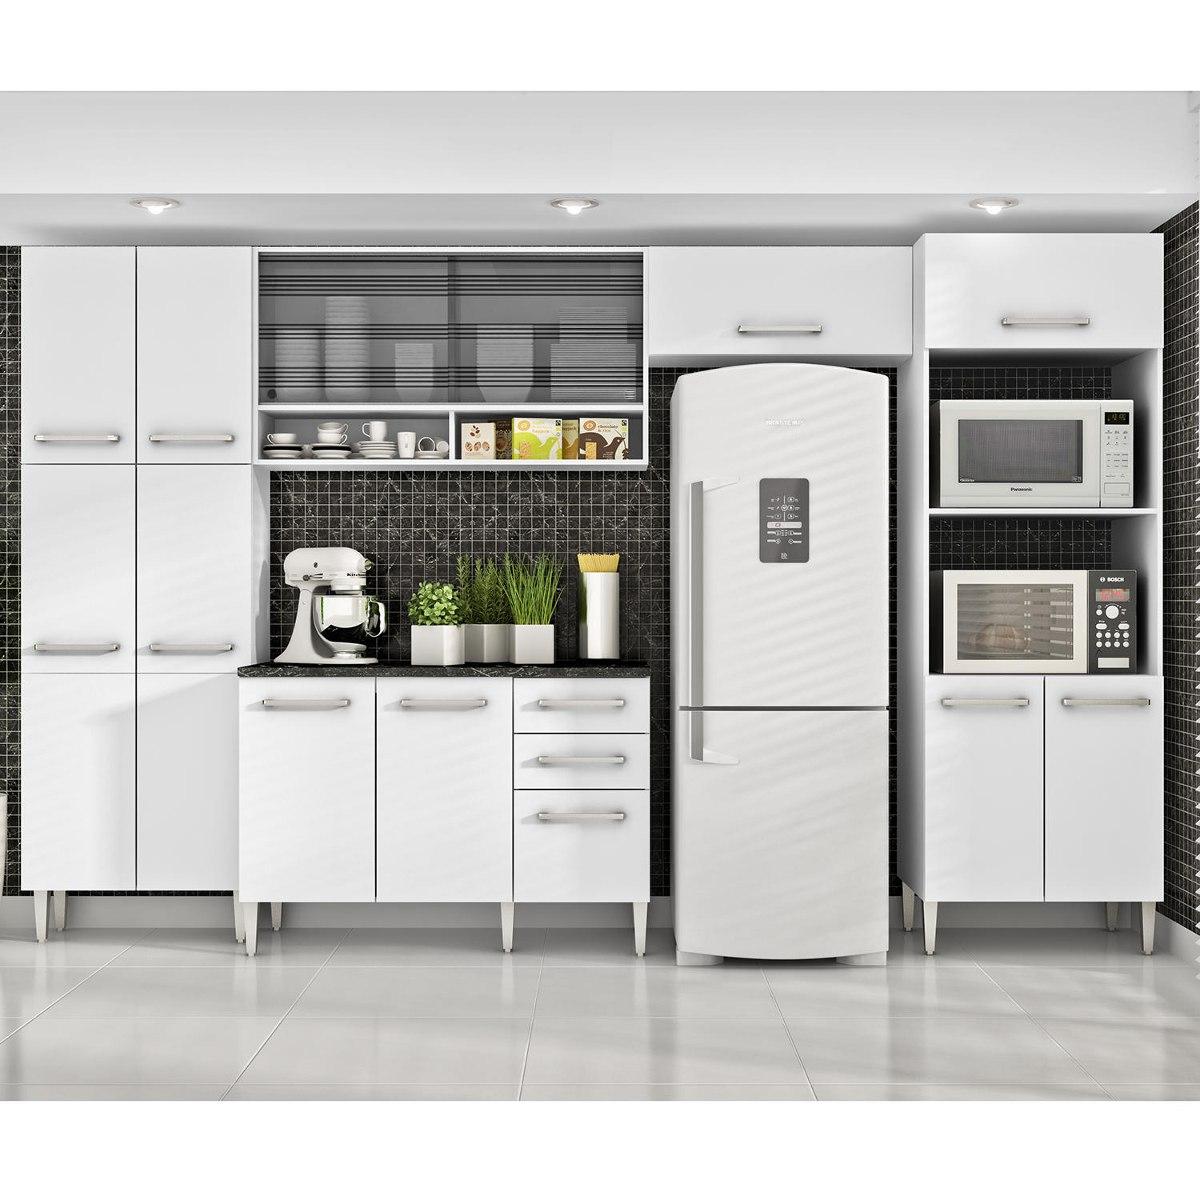 Cozinha Completa 5 Pe As Iris Glamy Madesa Branco Vid Hc R 1 999